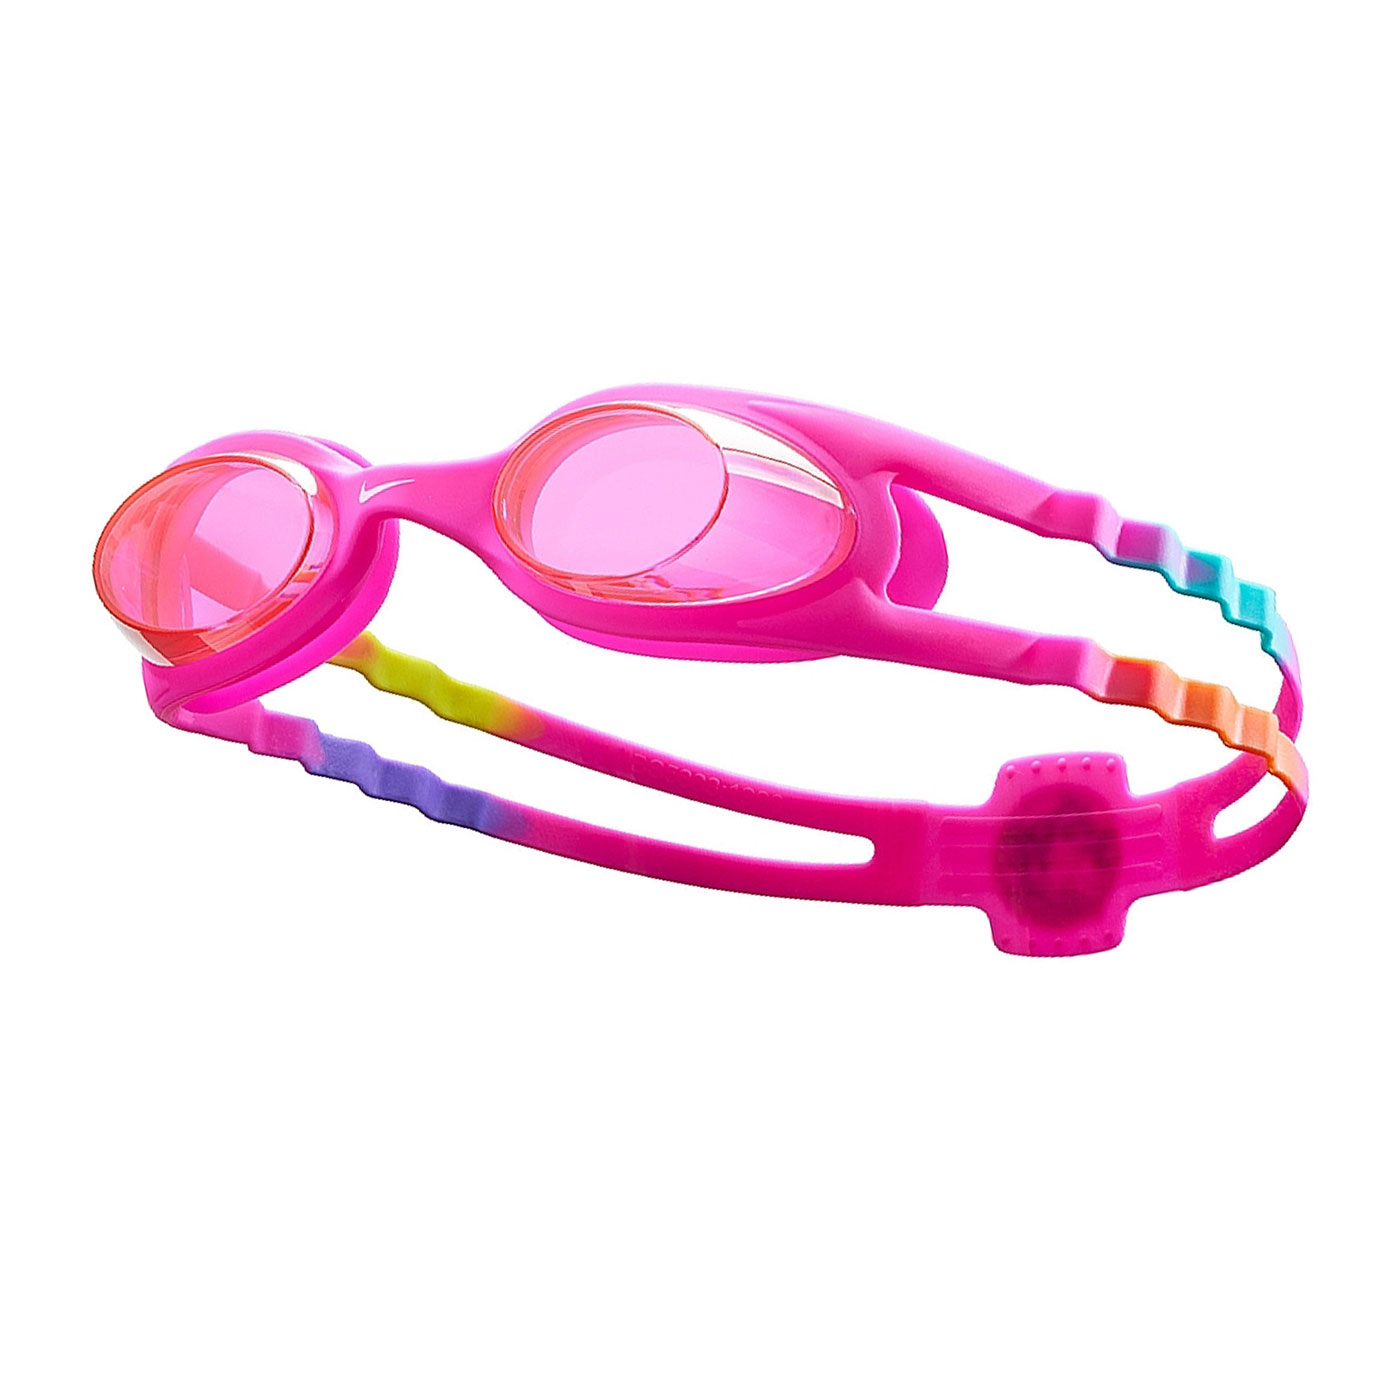 NIKE SWIM 兒童休閒泳鏡 NESSB166-656 - 桃紅白